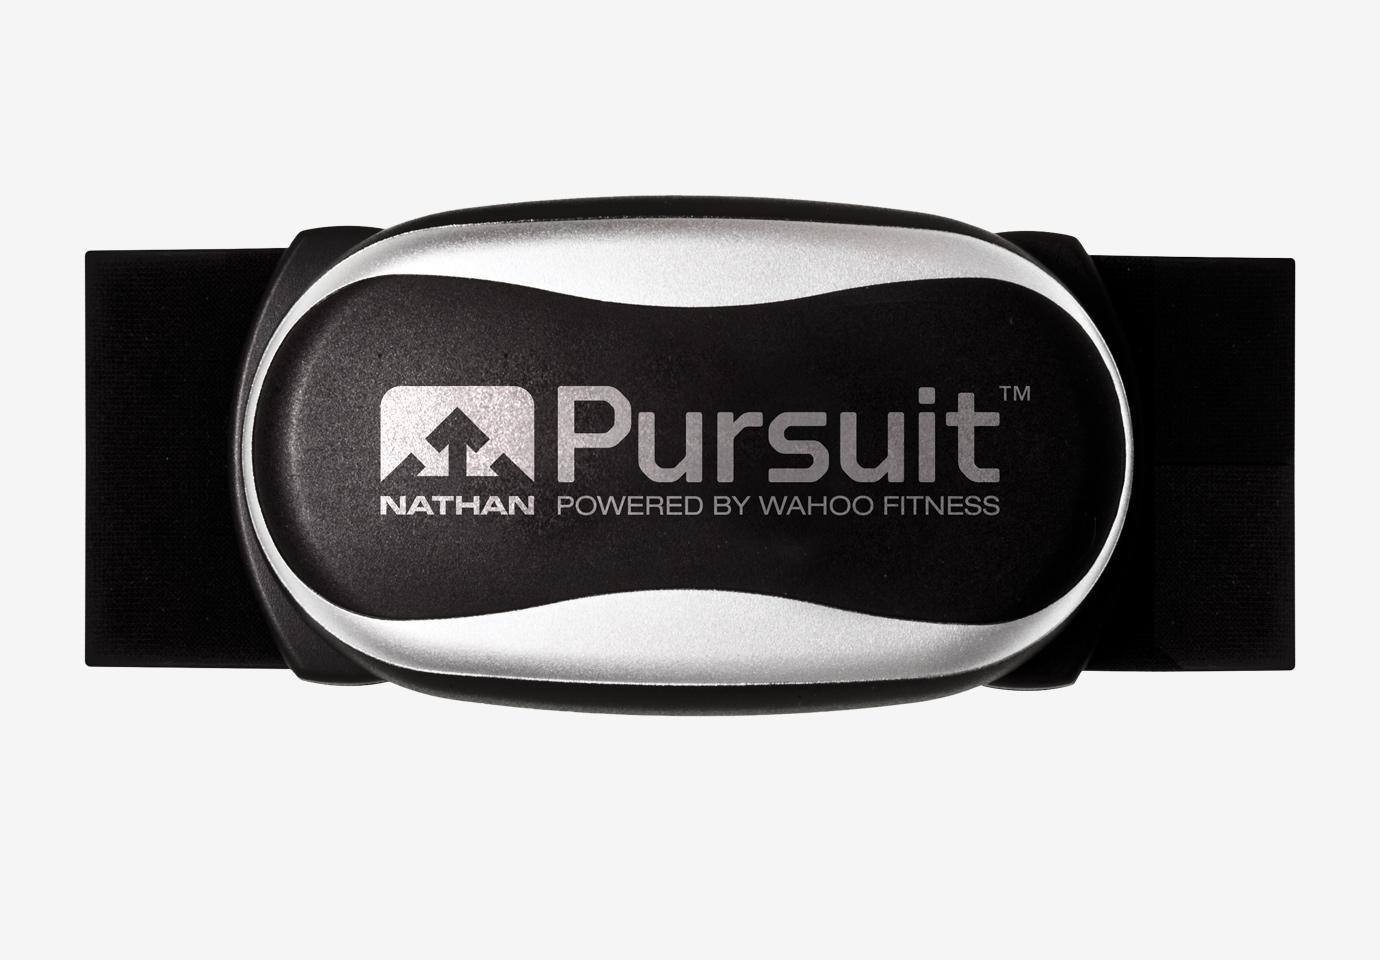 Nathan Sports Pursuit armband fitness monitor.